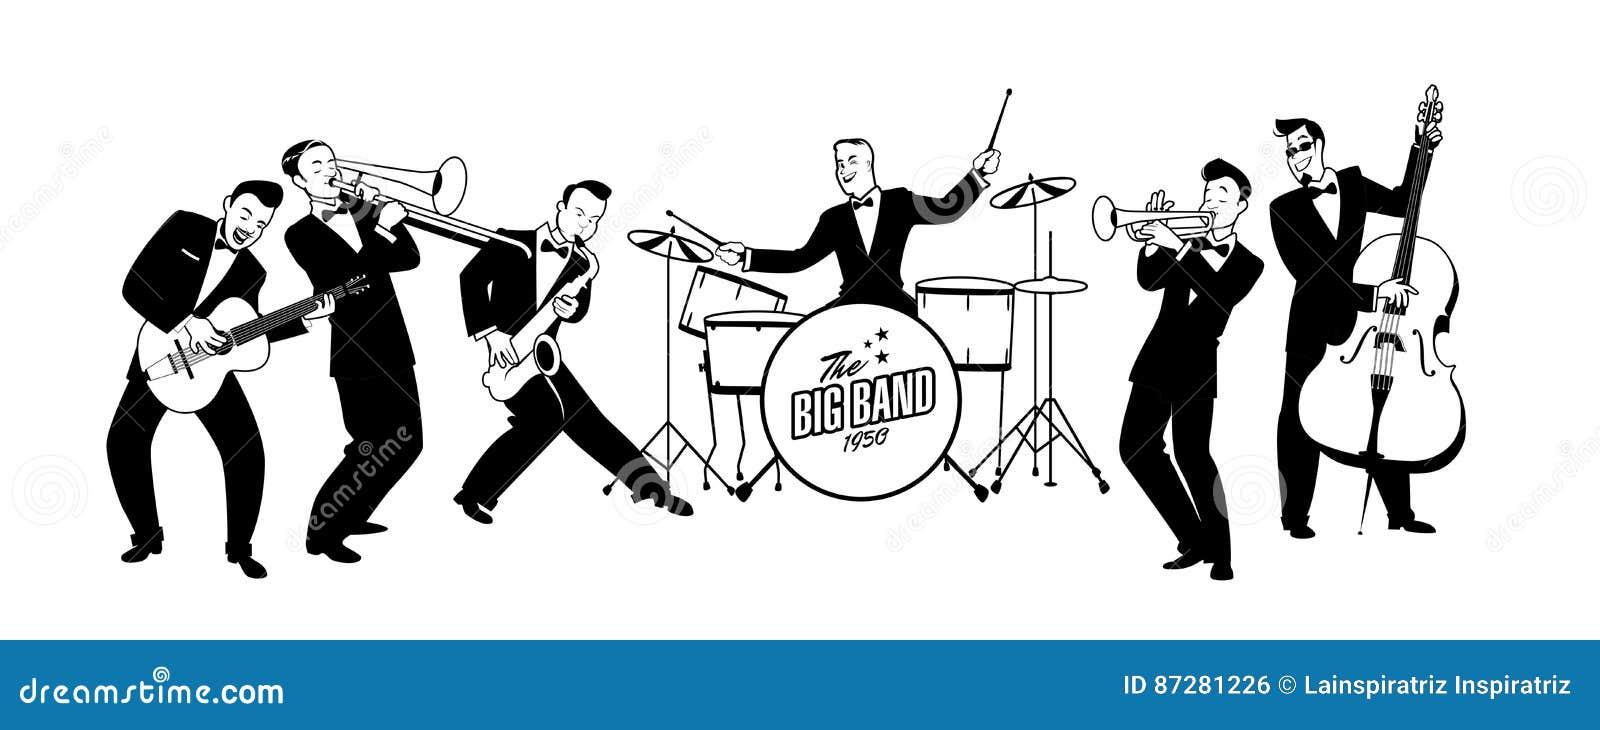 jazz swing orchestra  retro style  cartoon illustration